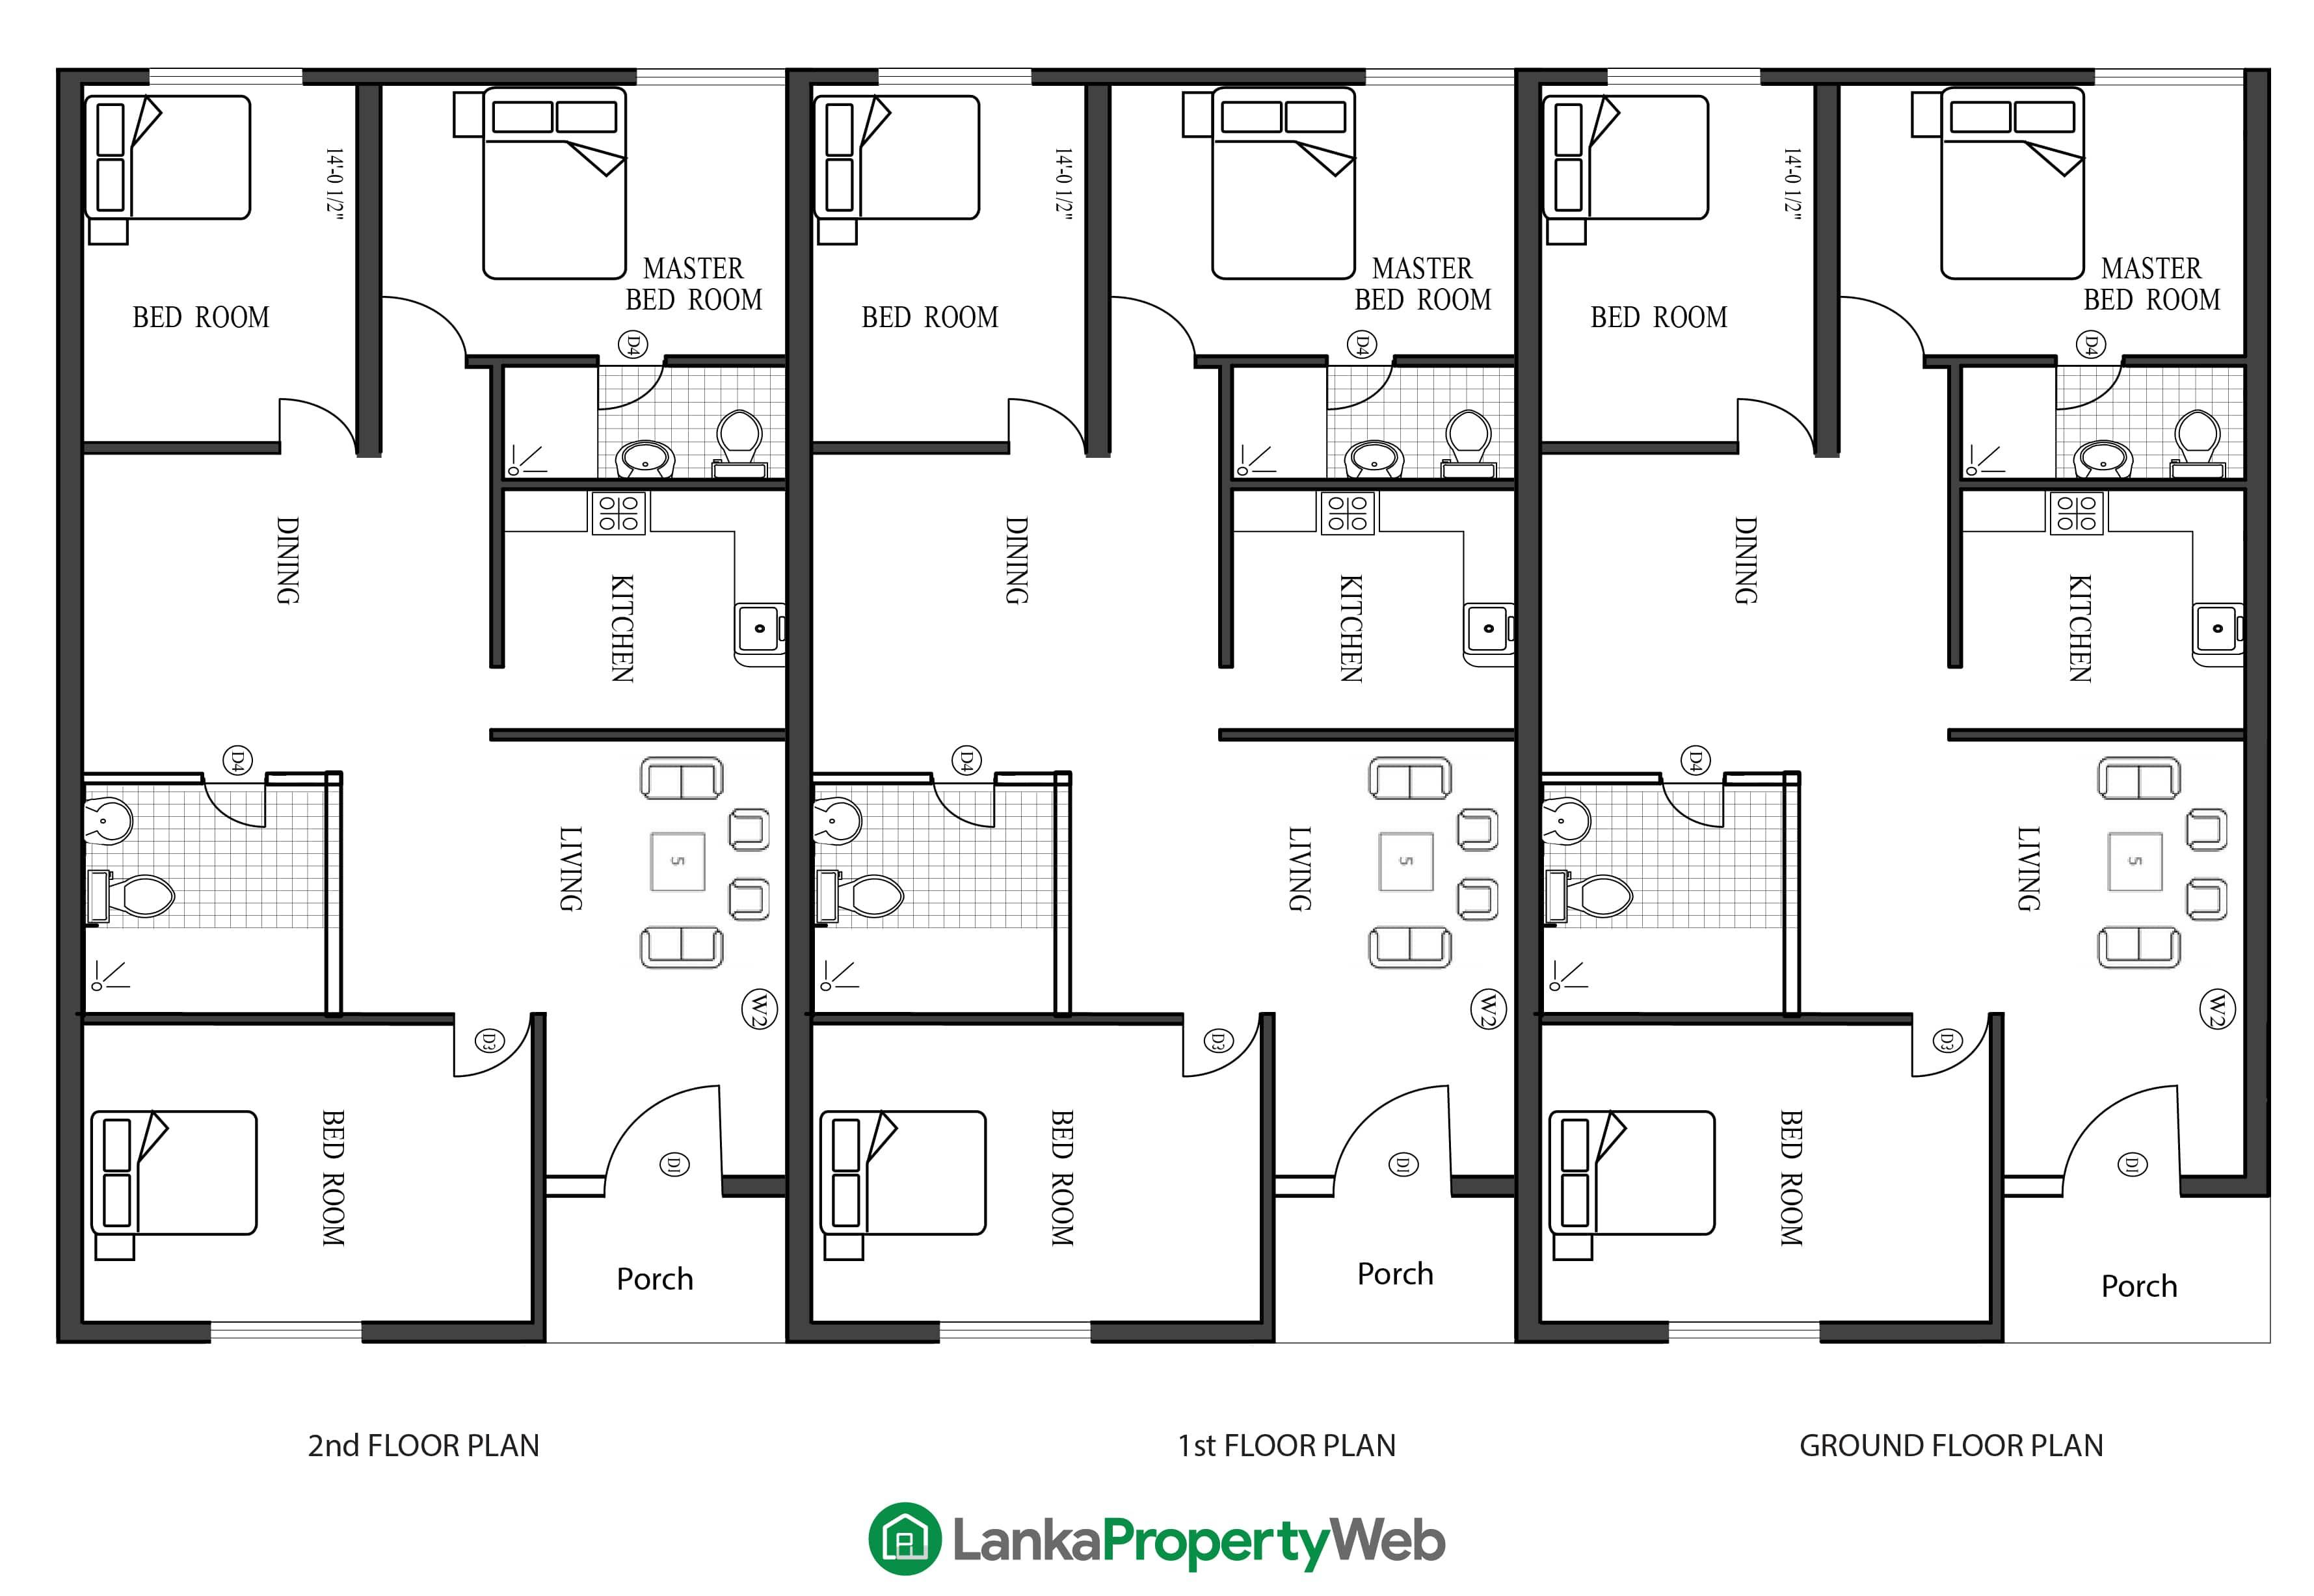 Triplex / Terraced house plan